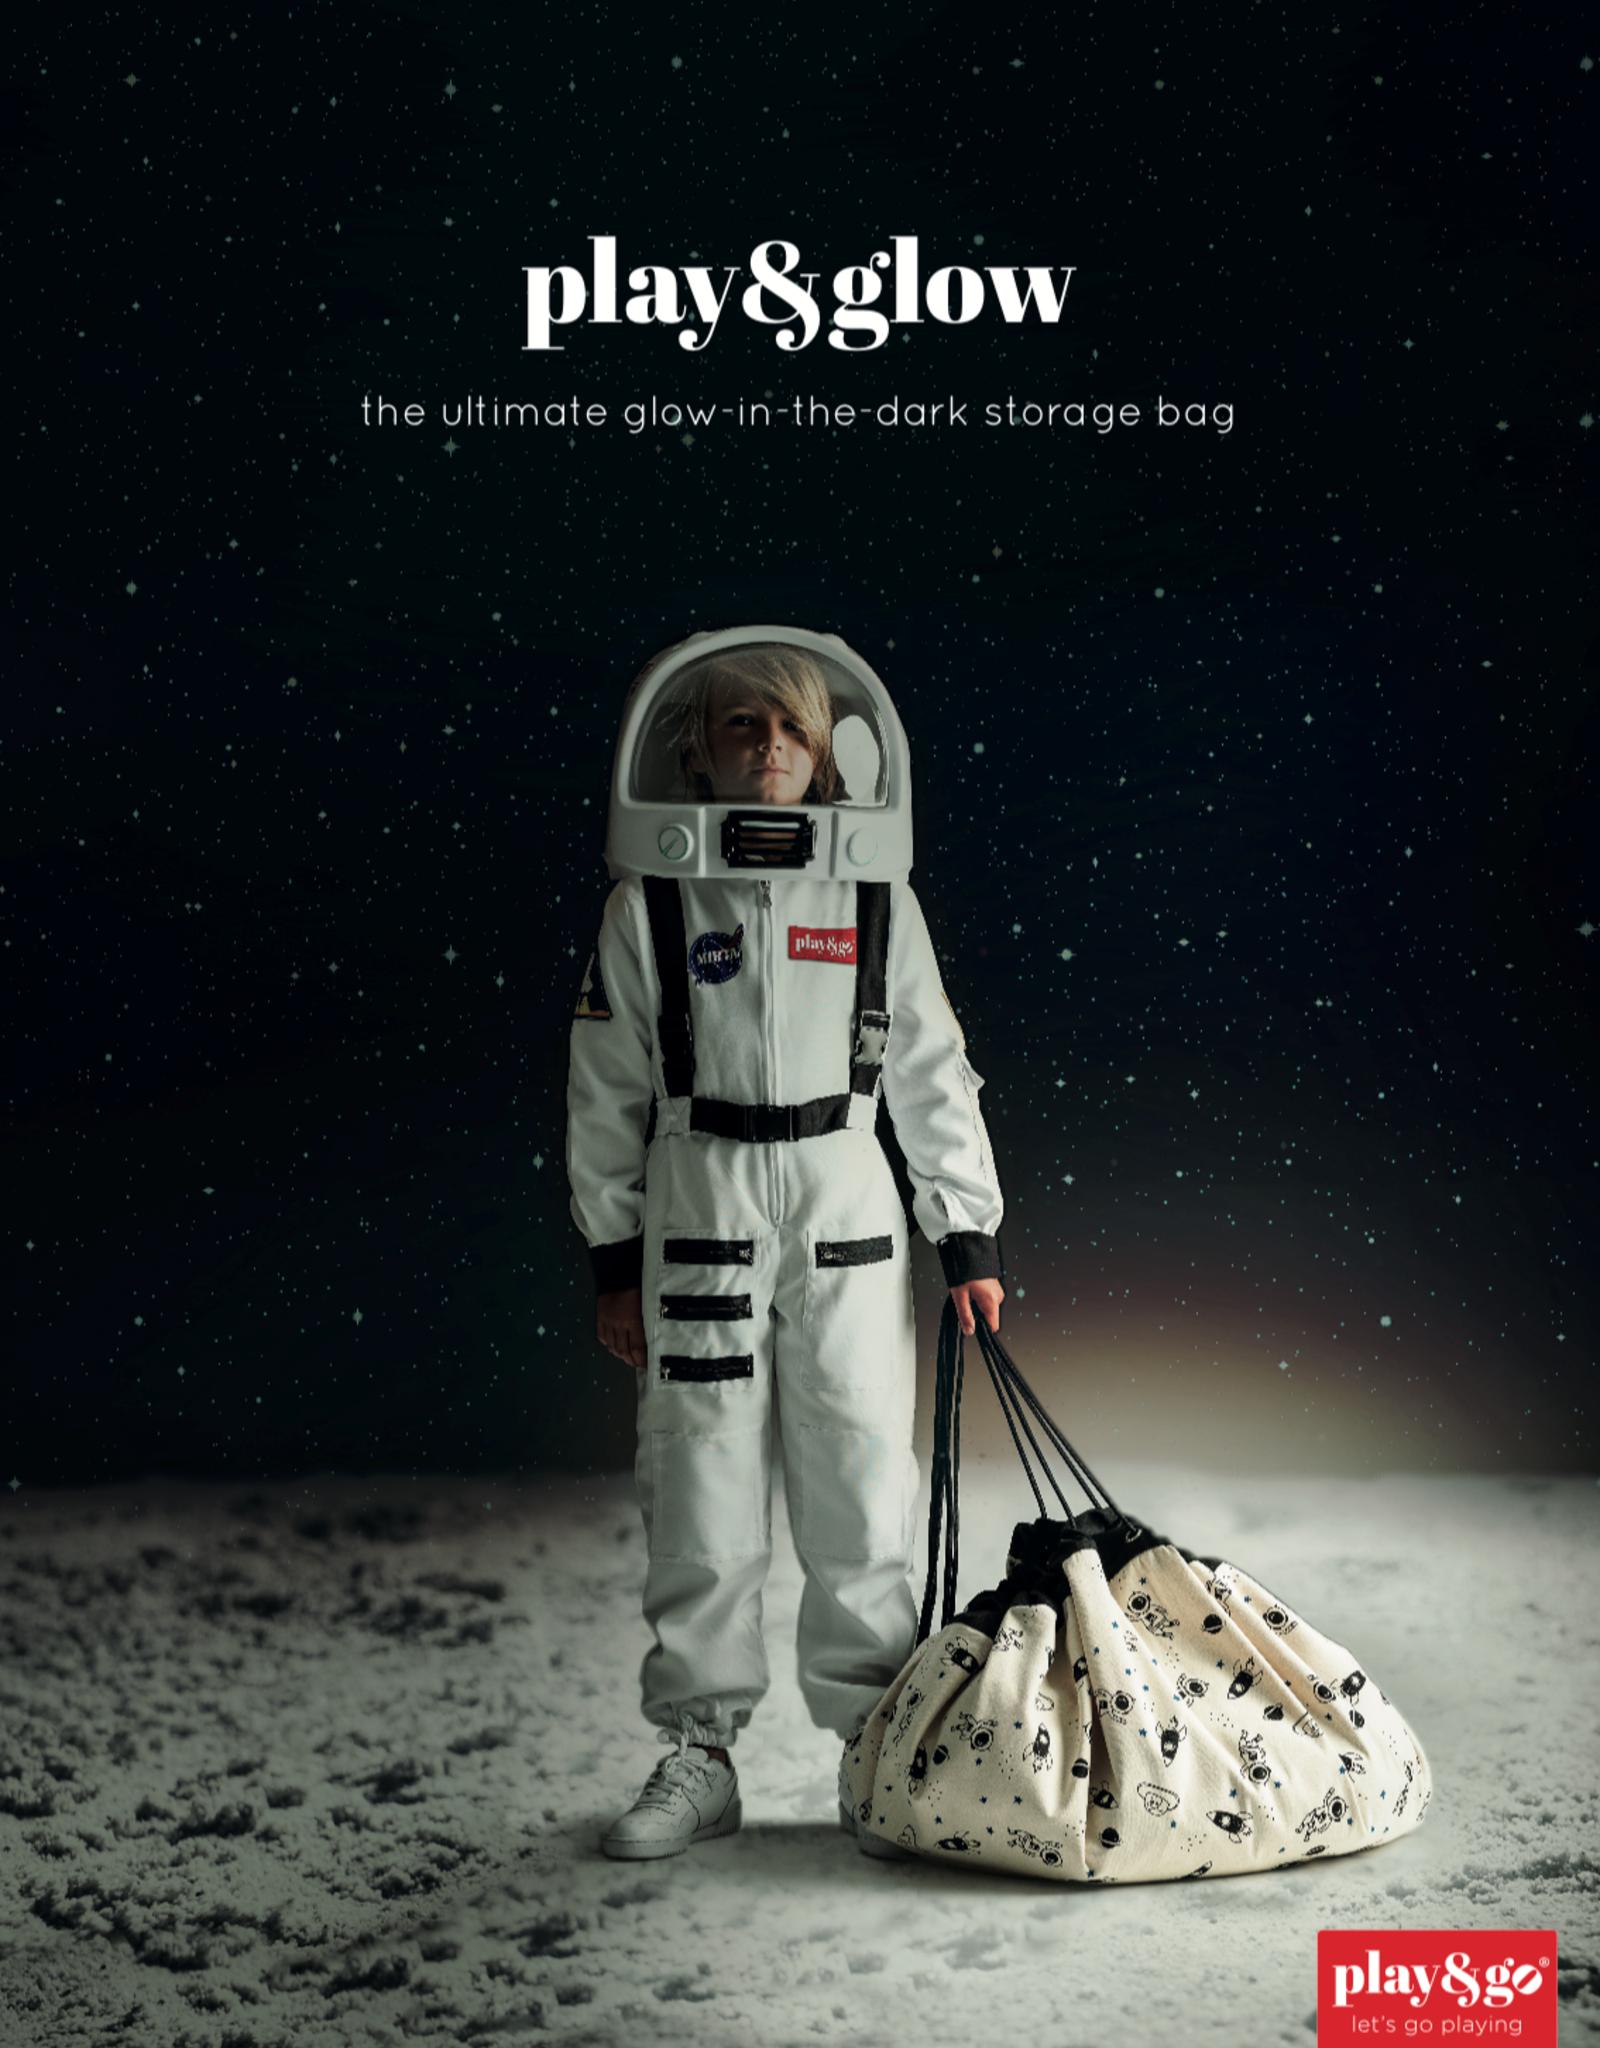 play & go Space Glow in the Dark toy storage